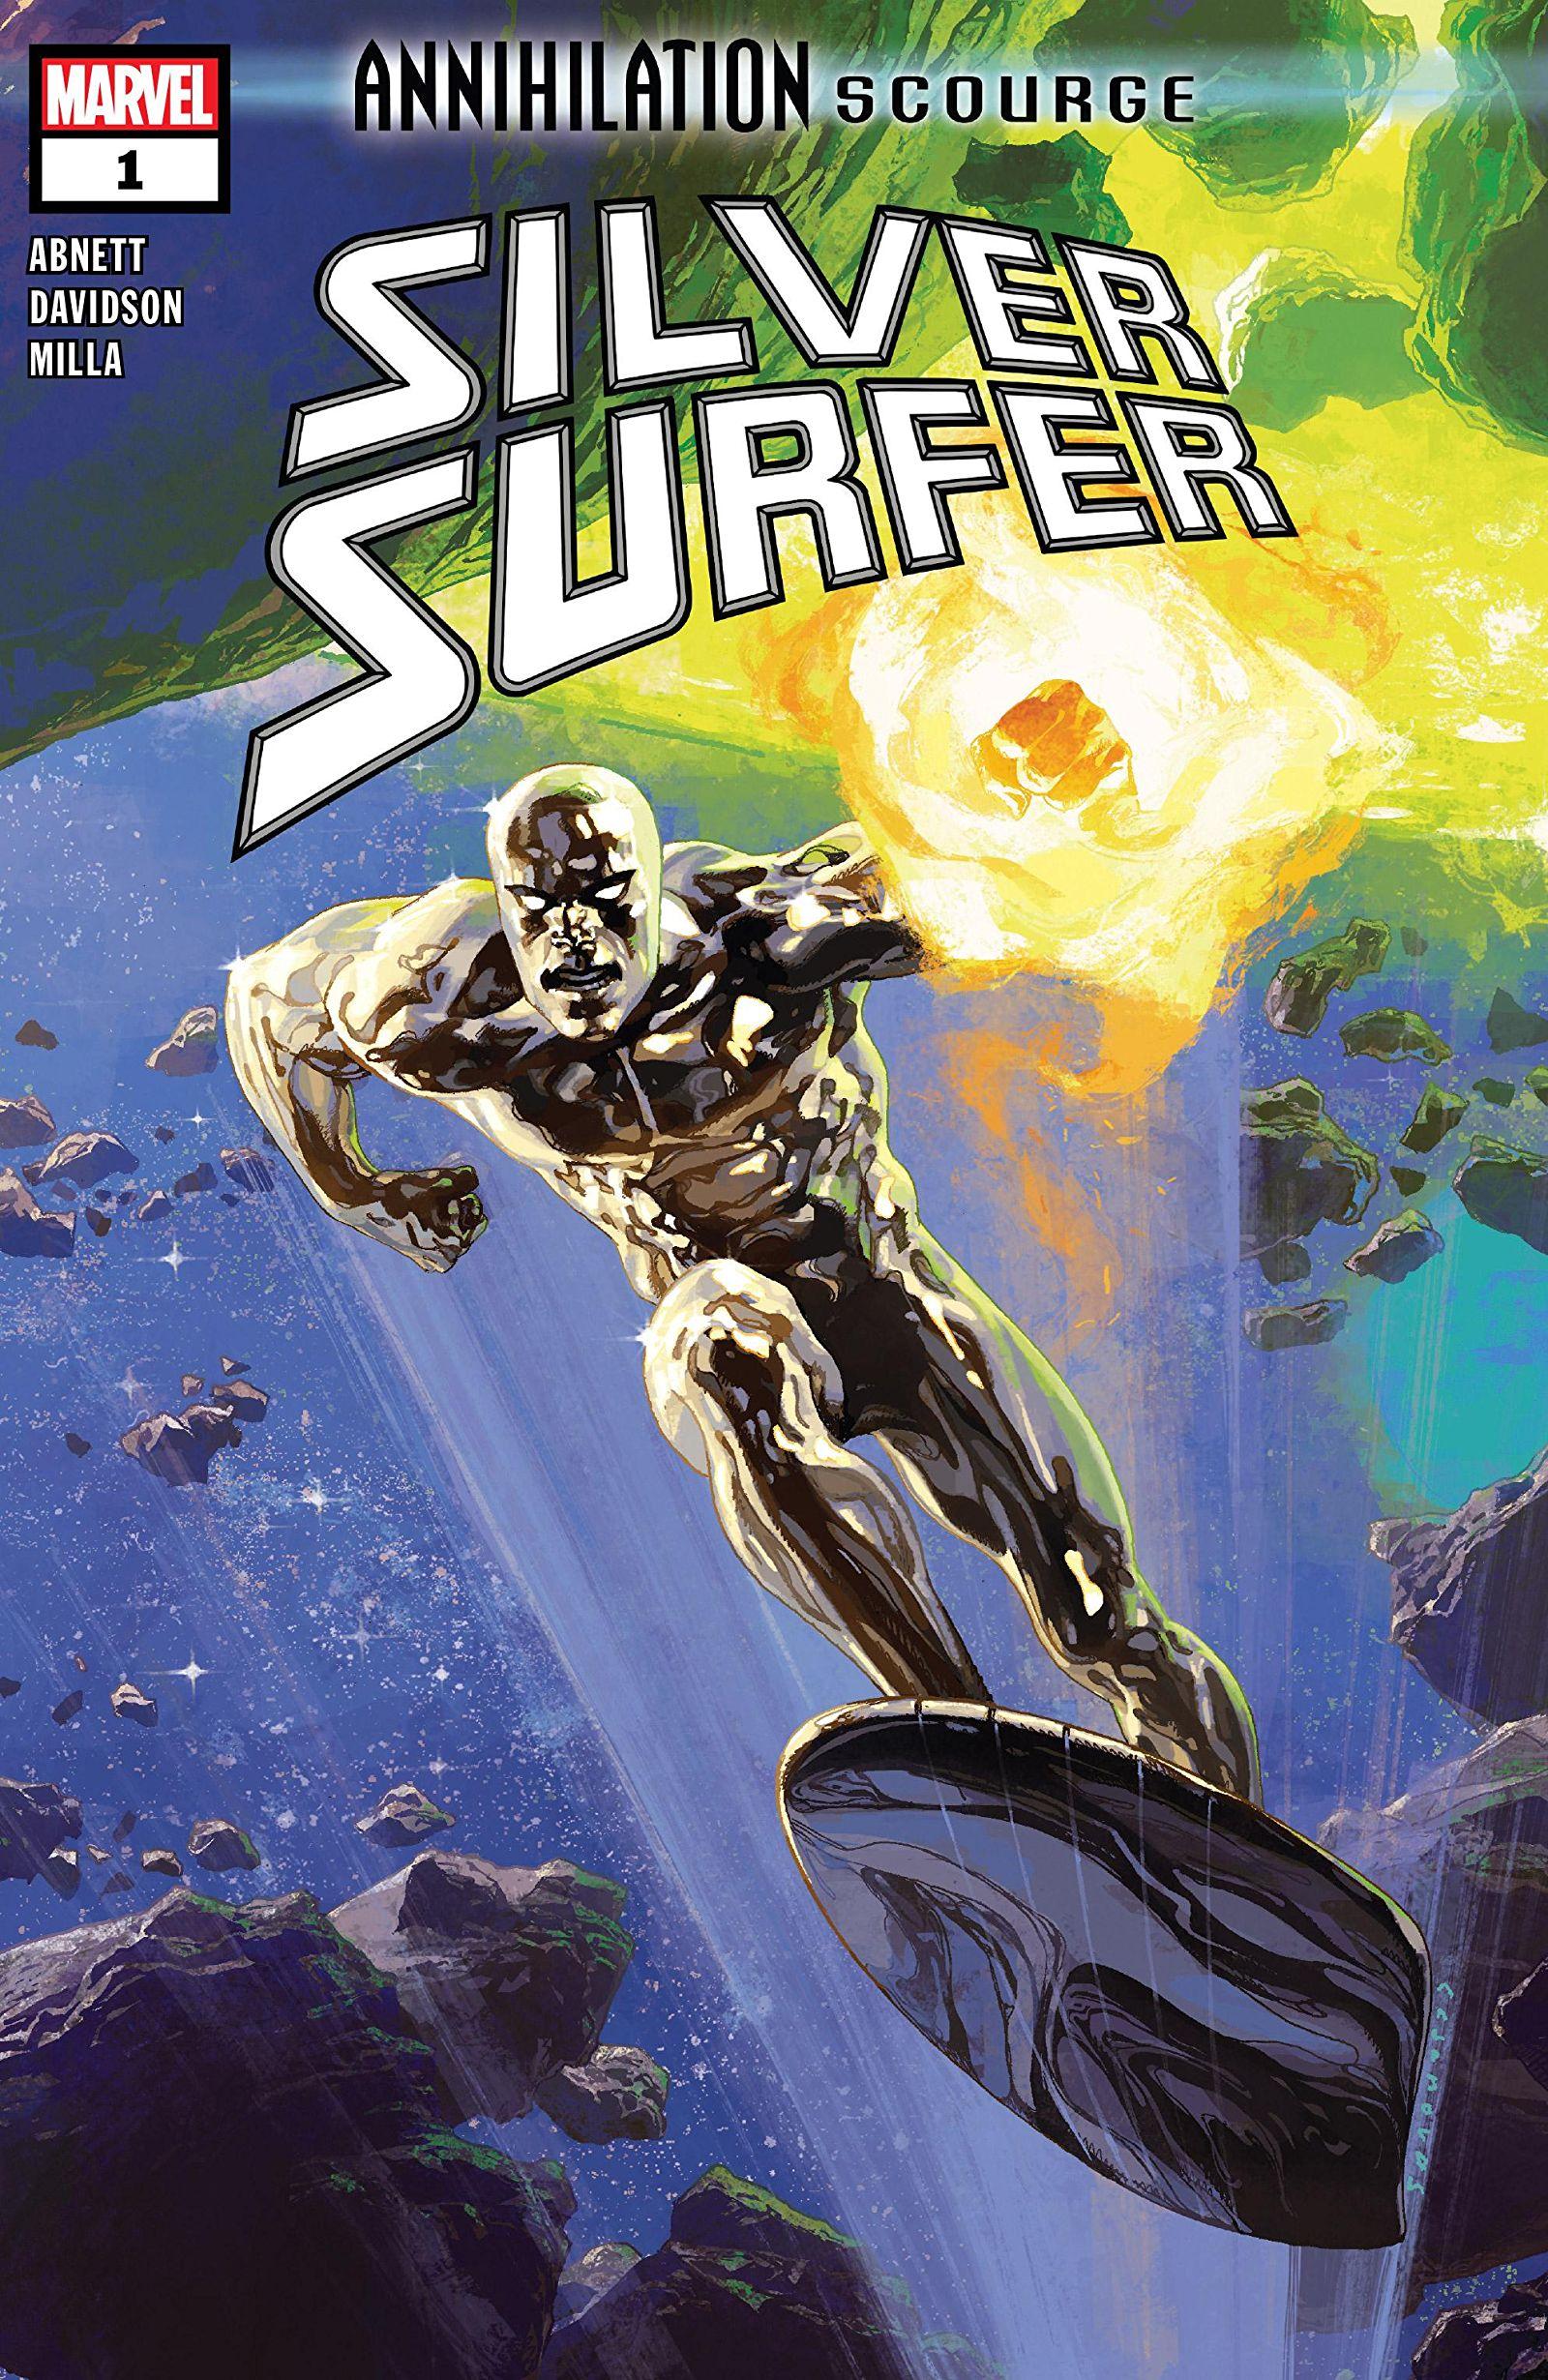 Annihilation - Scourge: Silver Surfer Vol 1 1